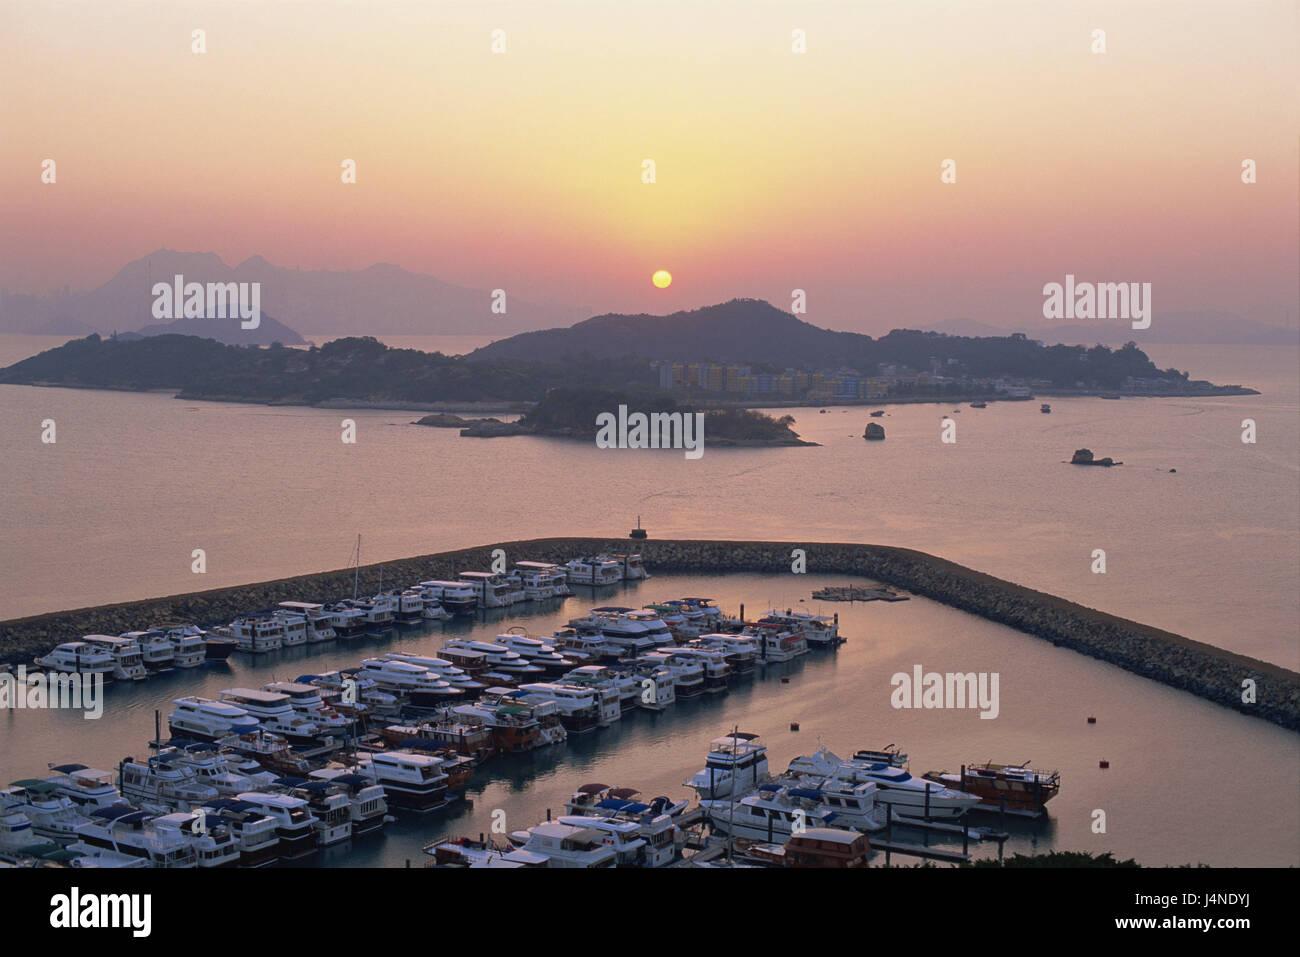 China, Hong Kong, Lantau Iceland, Discovery Bay Marina club, Bang Chau Iceland, sea, sundown, Asia, town, island, - Stock Image